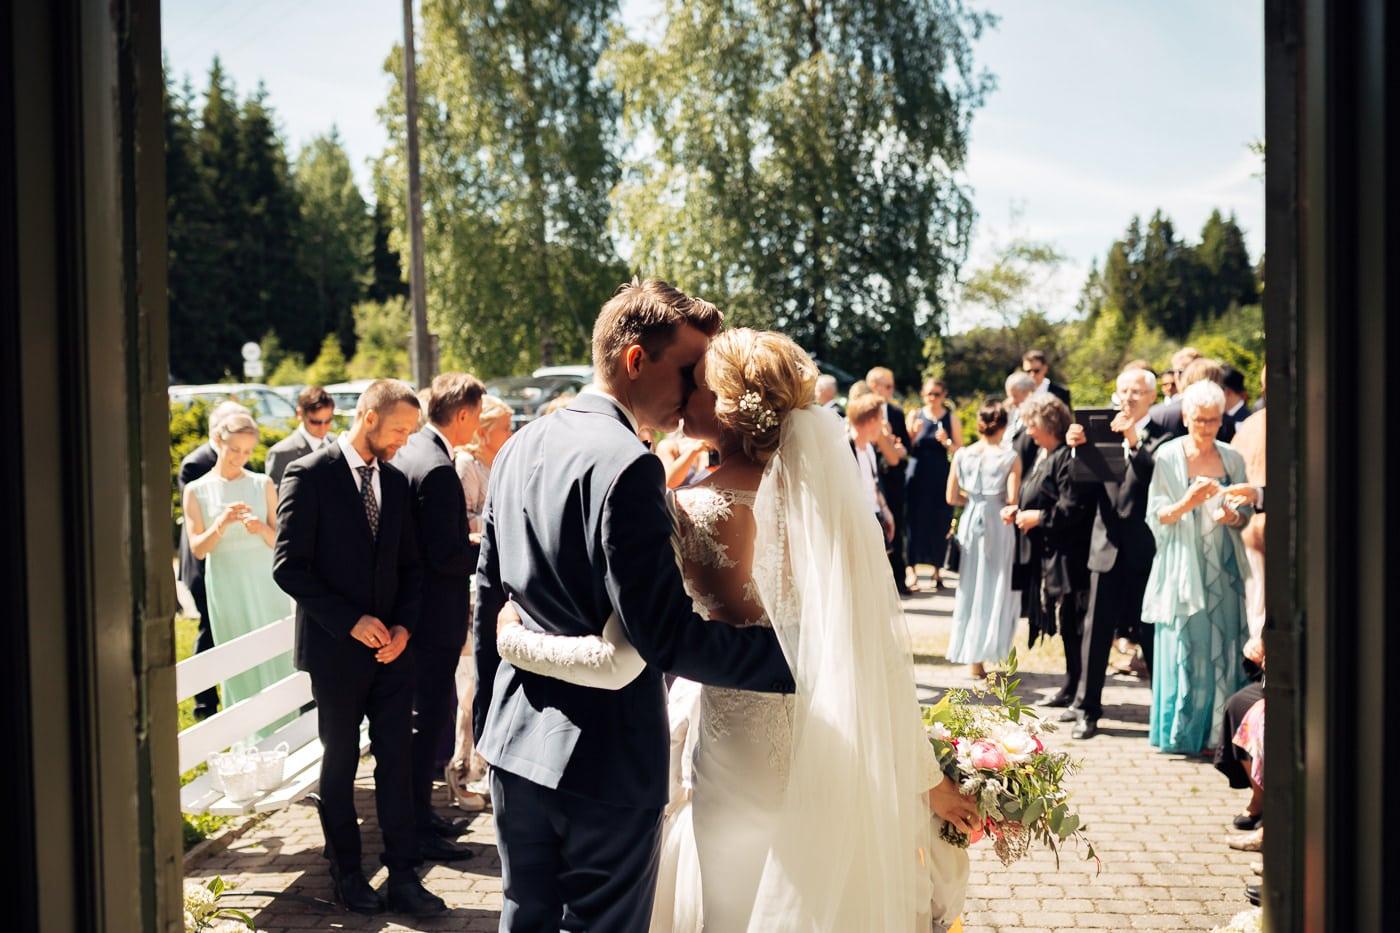 Karoline & Andreas - bryllup i Østfold med magiske detaljer Bryllup Fredrikstad Fotograf 31